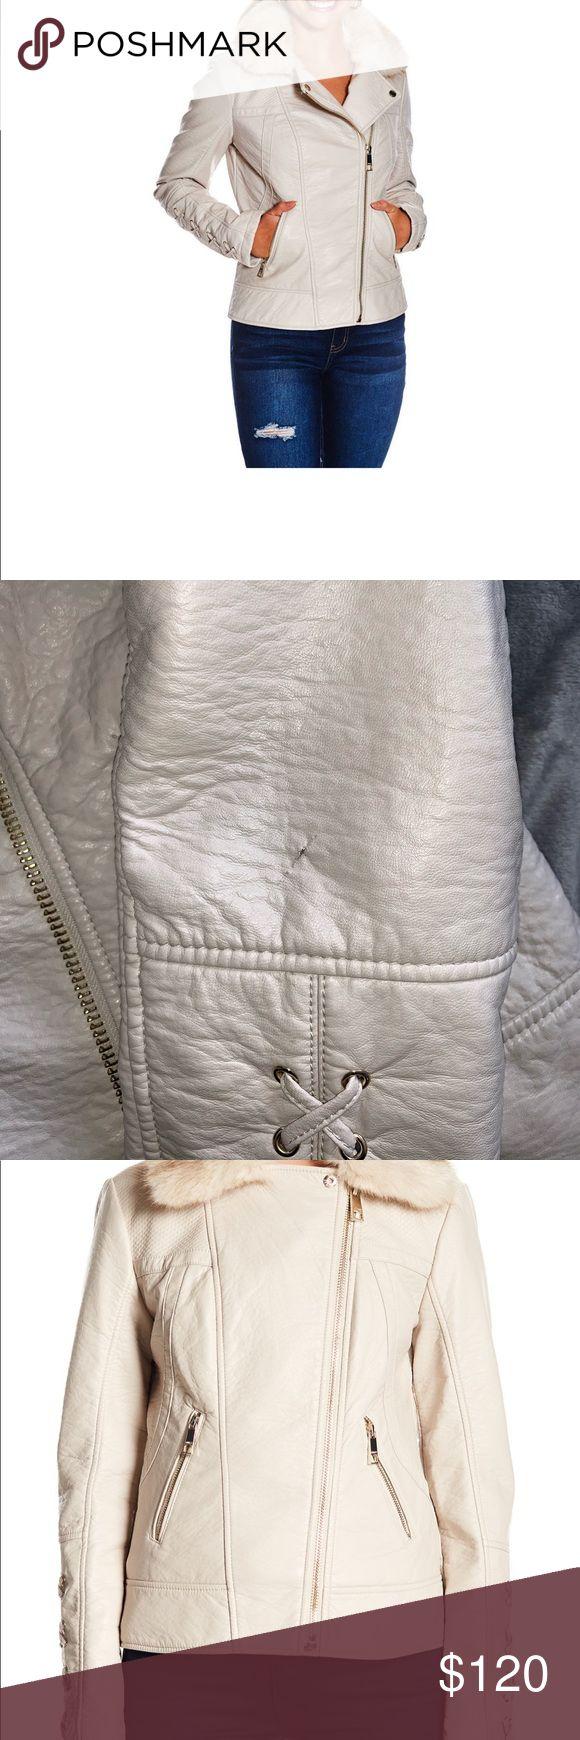 Guess Faux fur &leather moto Jacket in 2020 Moto jacket